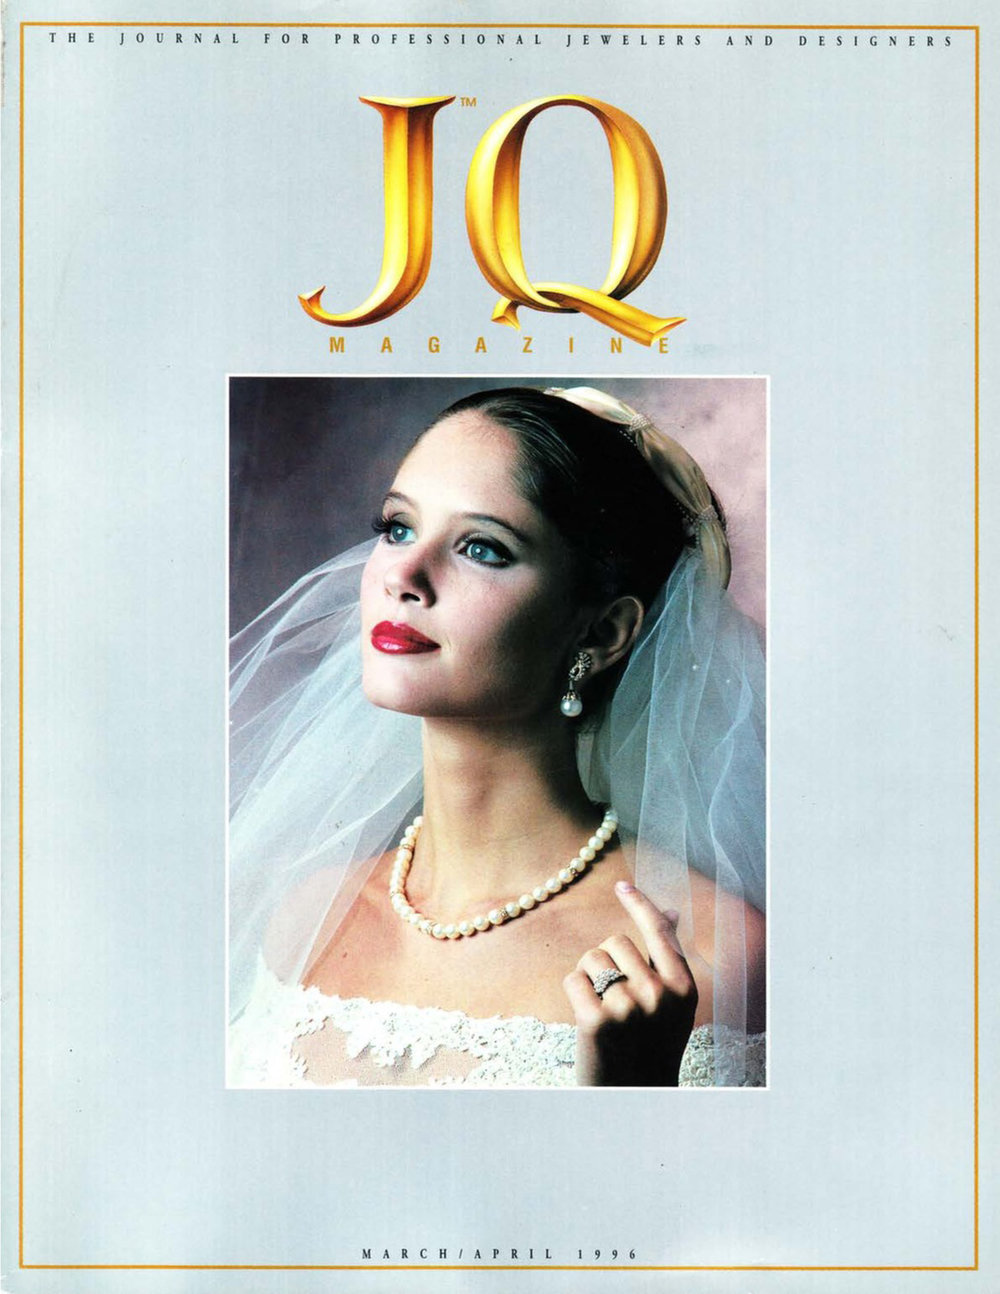 jq-magazine-web.jpg